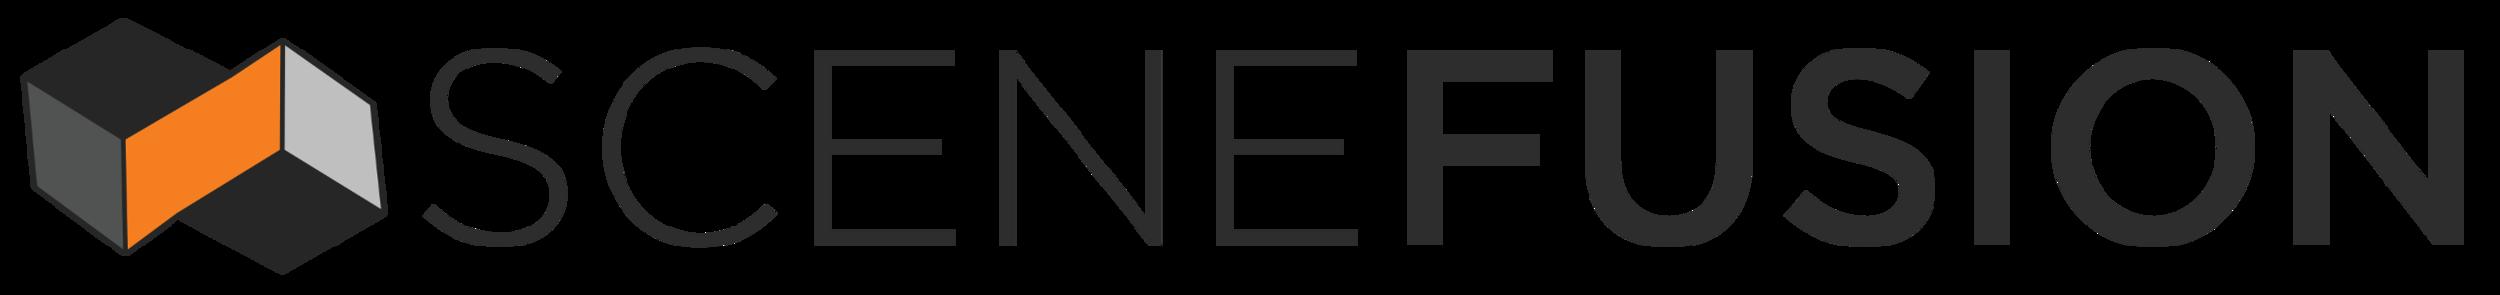 scenefusion_logo.png